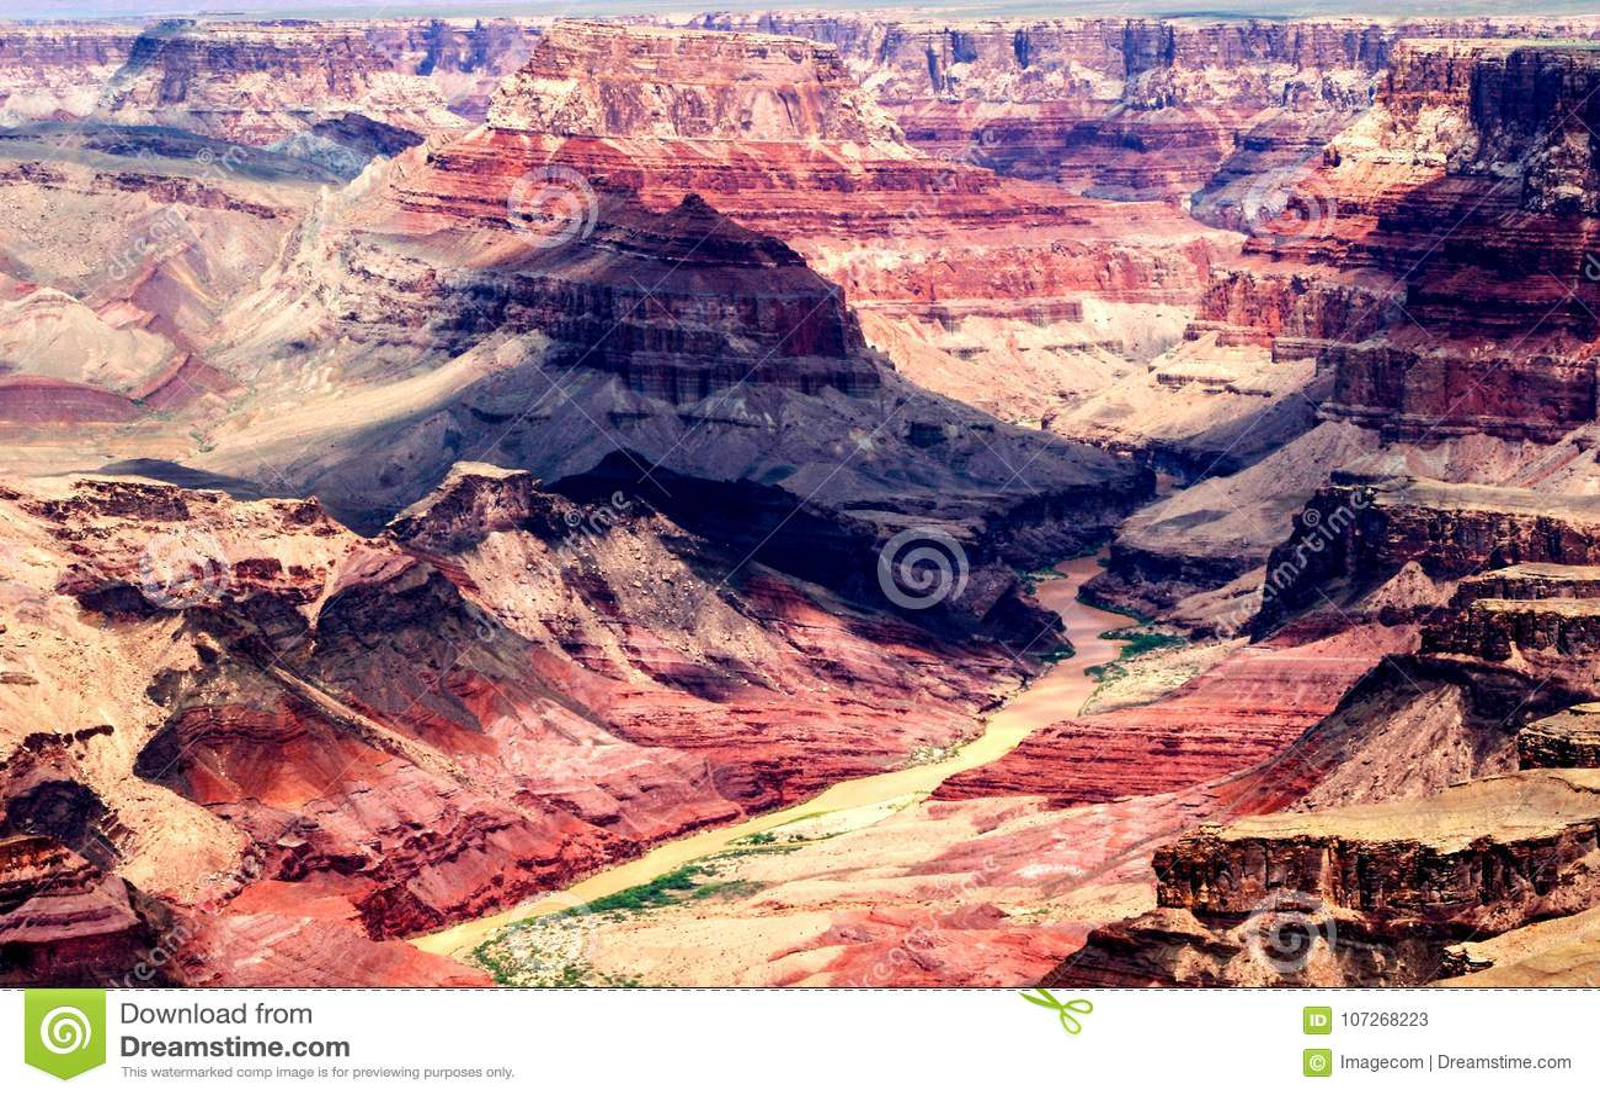 Grand Canyon Arizona Landscape U S A Stock Image Image Of